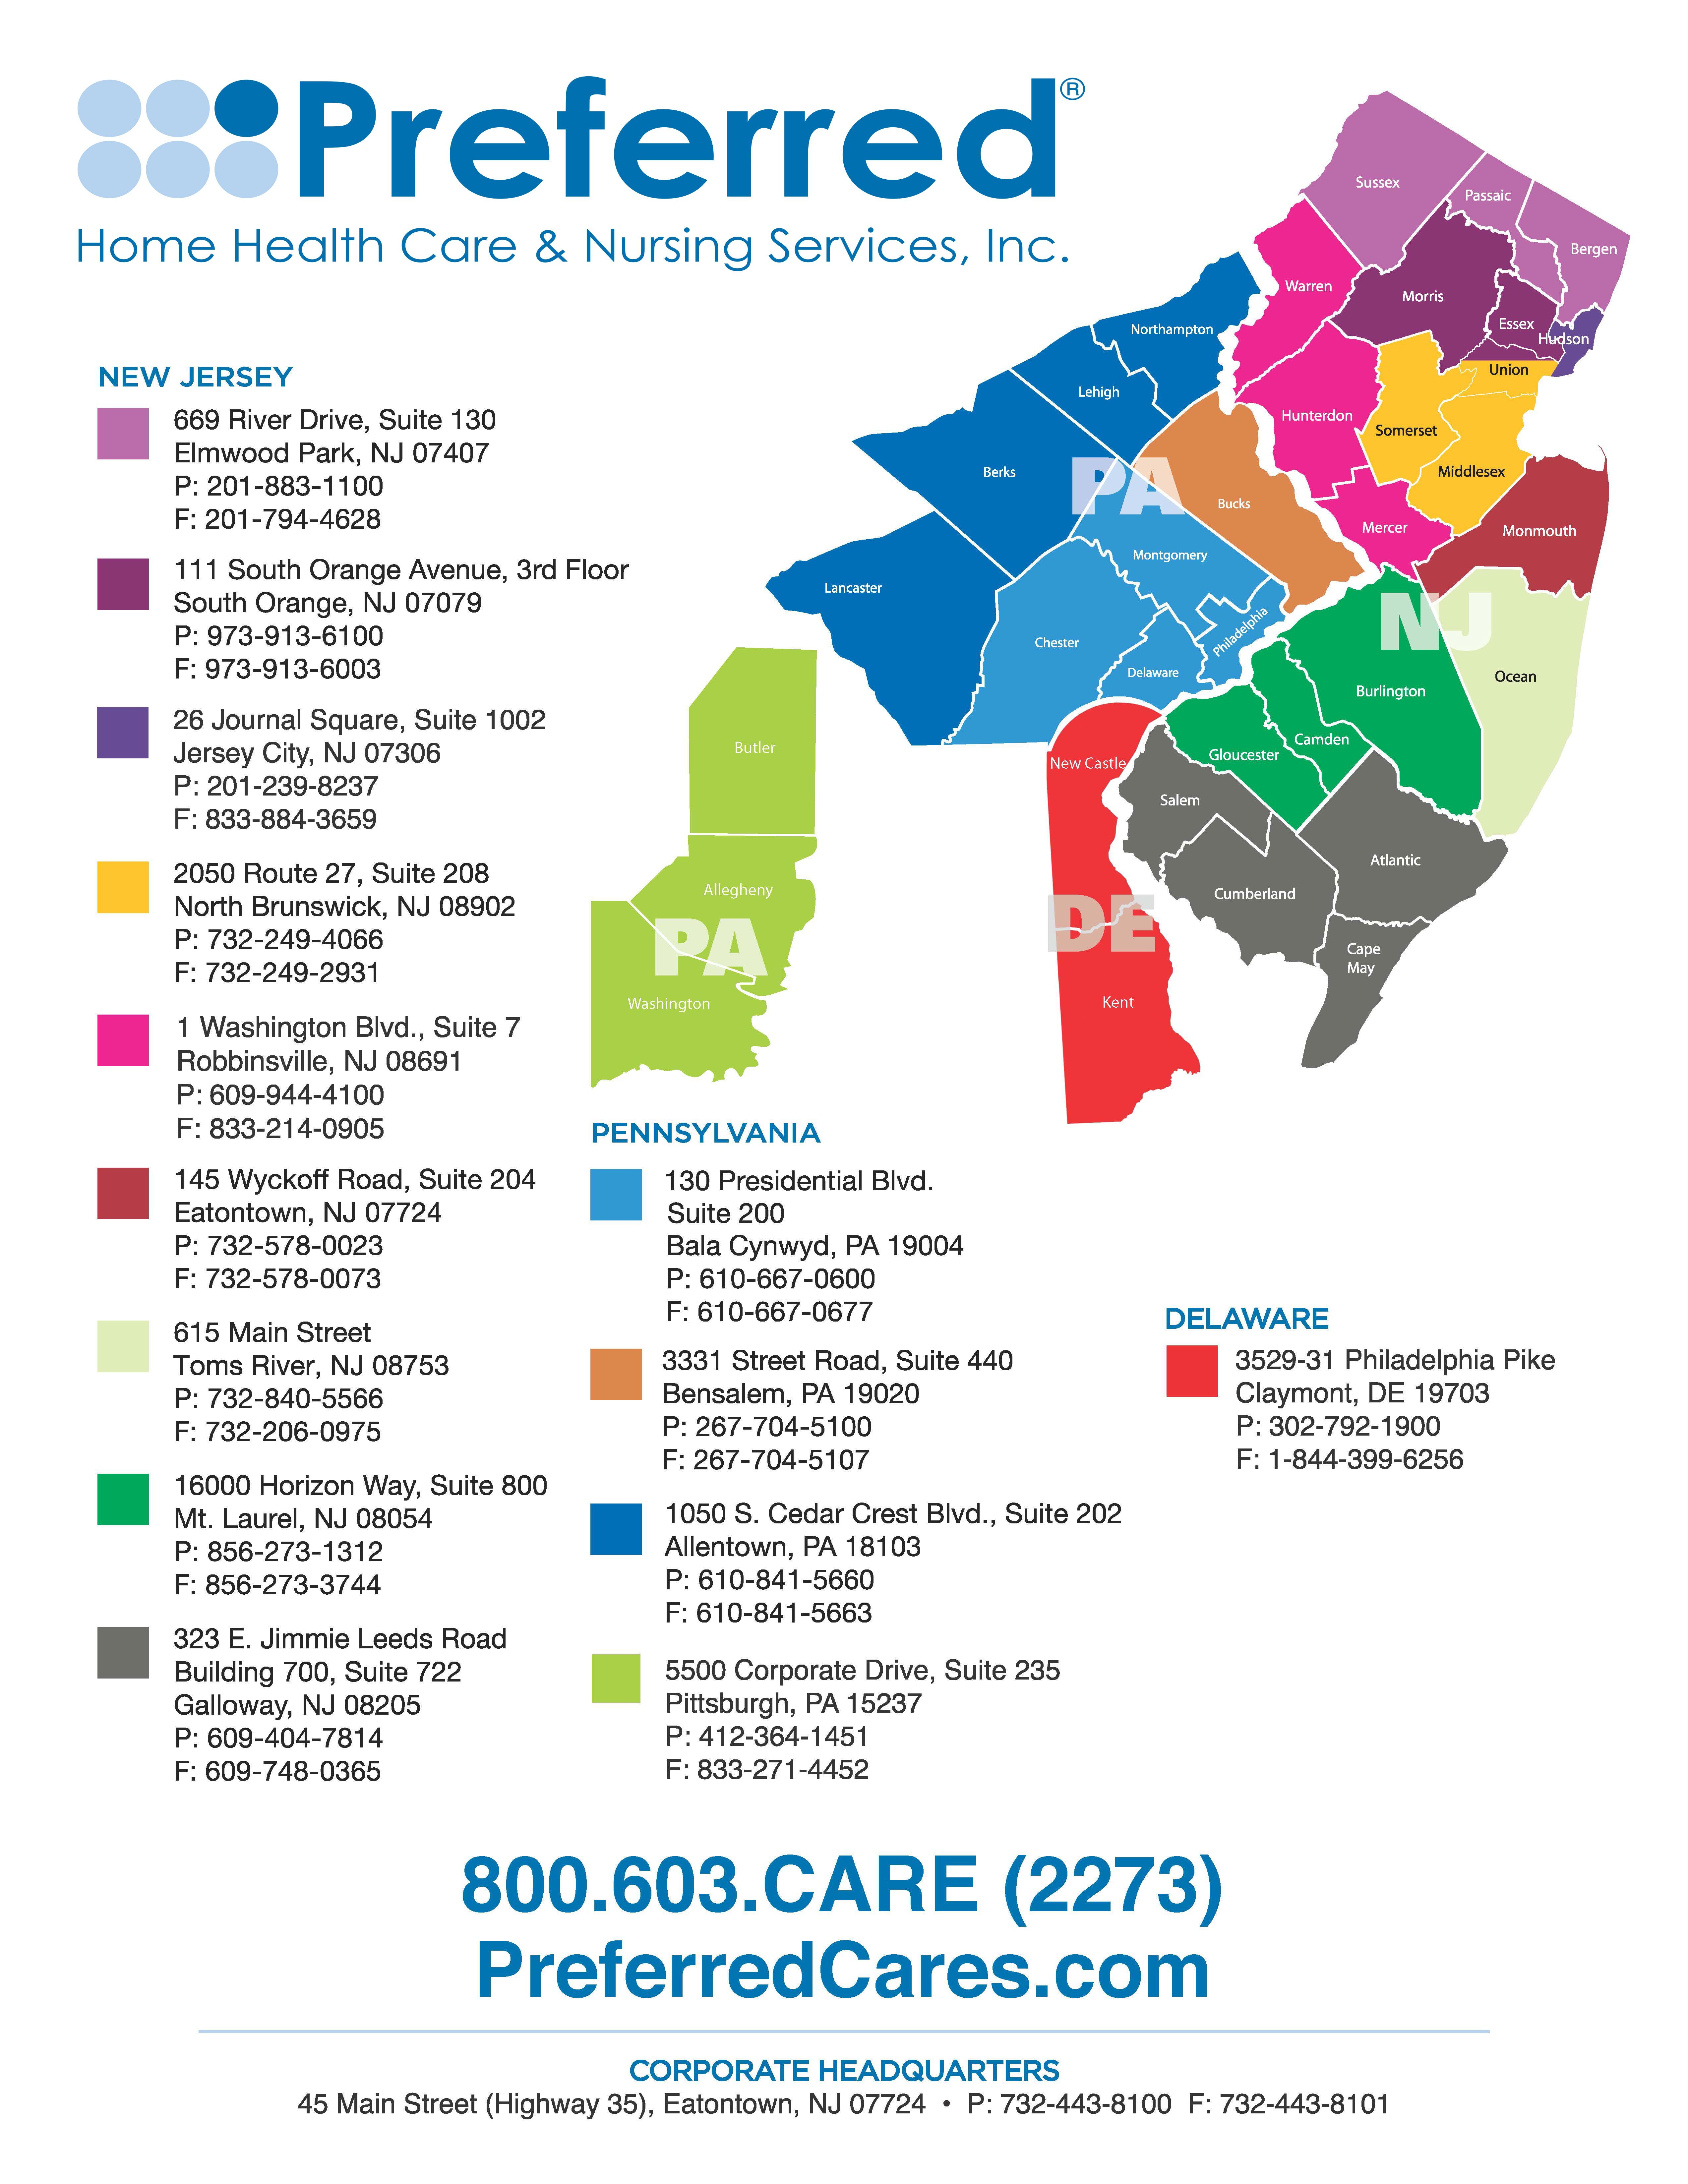 Preferred Home Health Care & Nursing Services Coverage Area Map